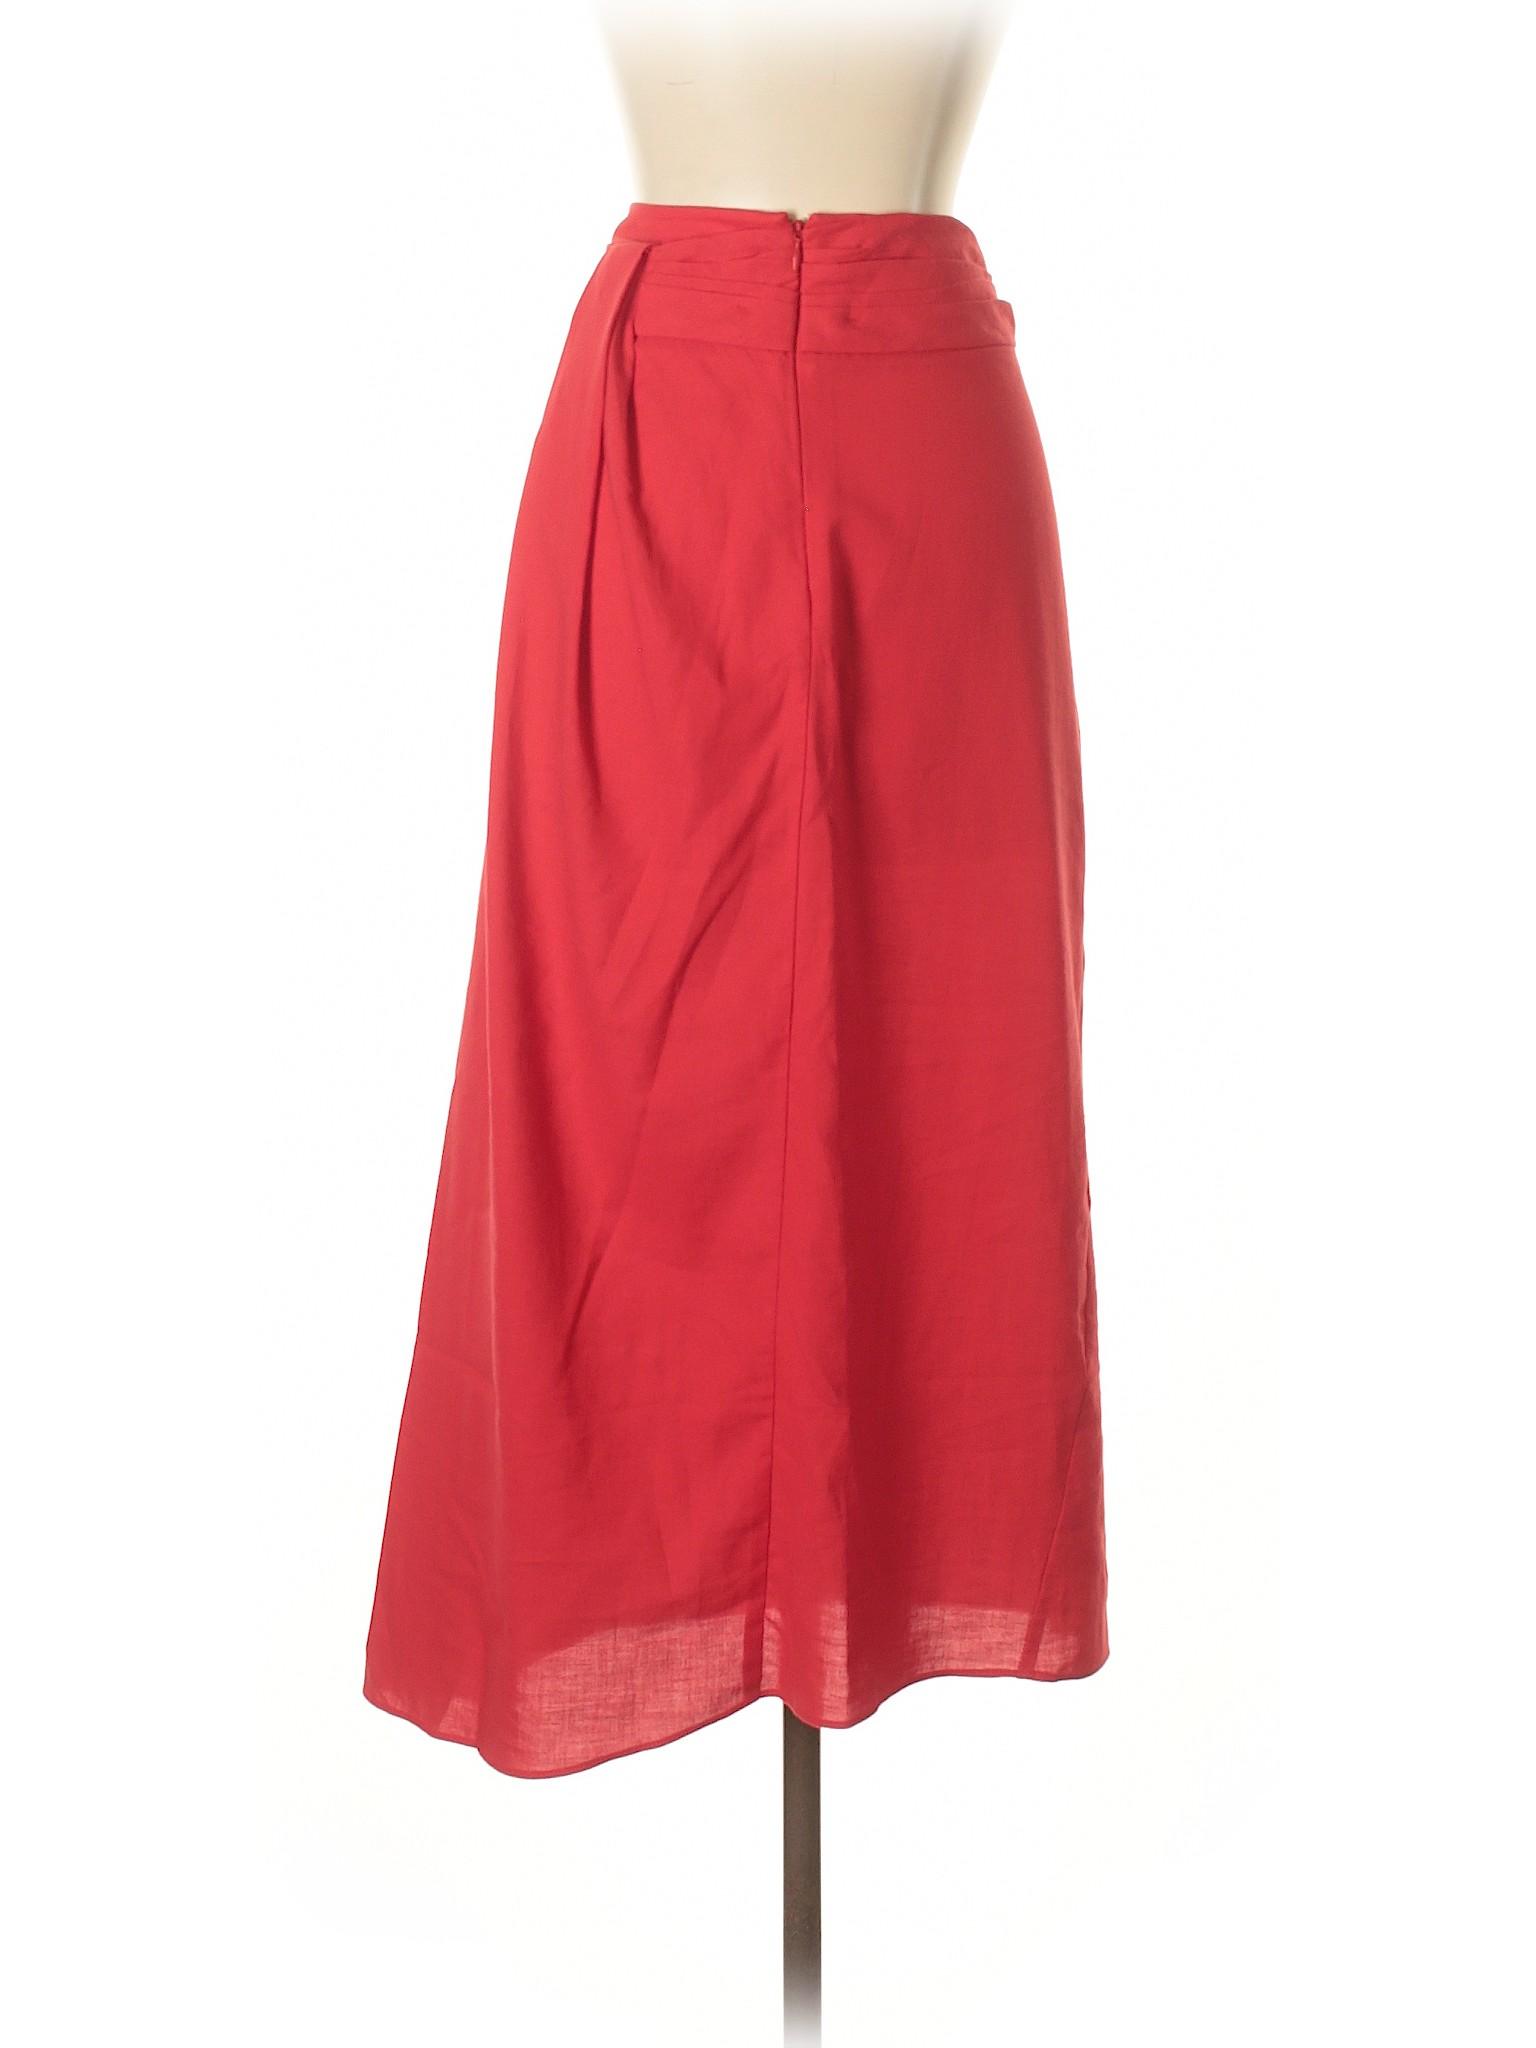 Boutique Casual Skirt Boutique Casual r7qPr